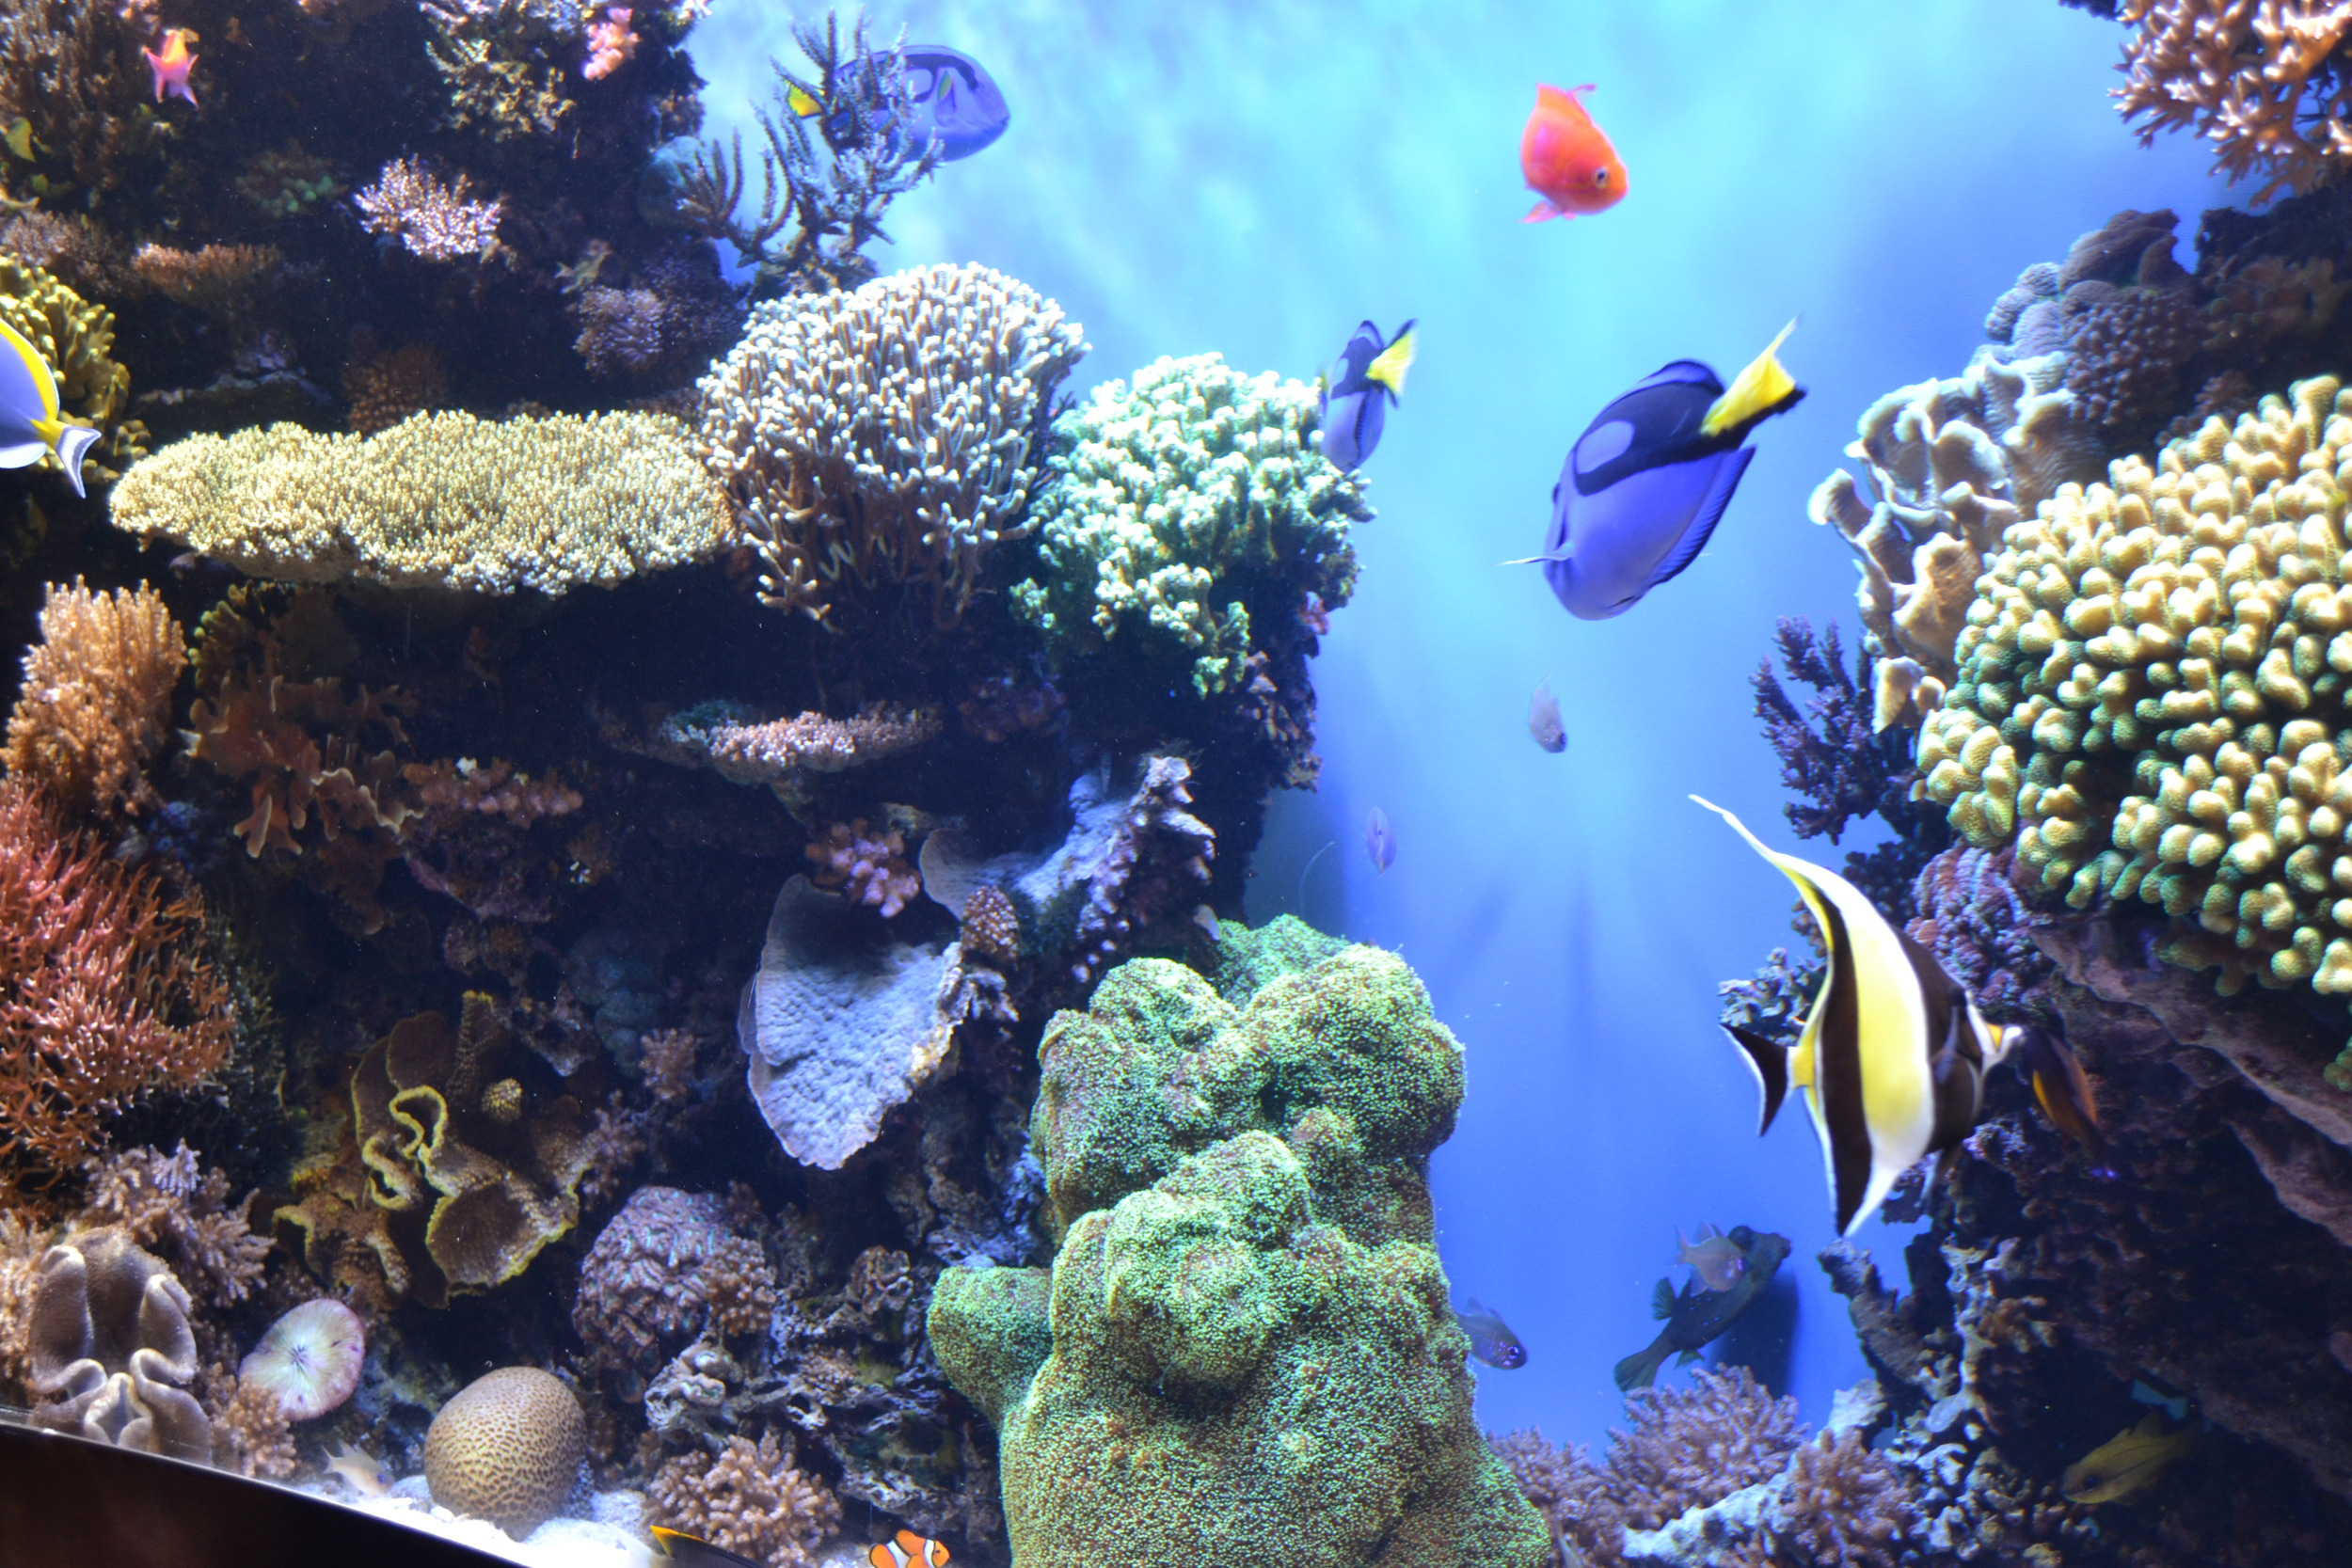 I think we found Nemo!